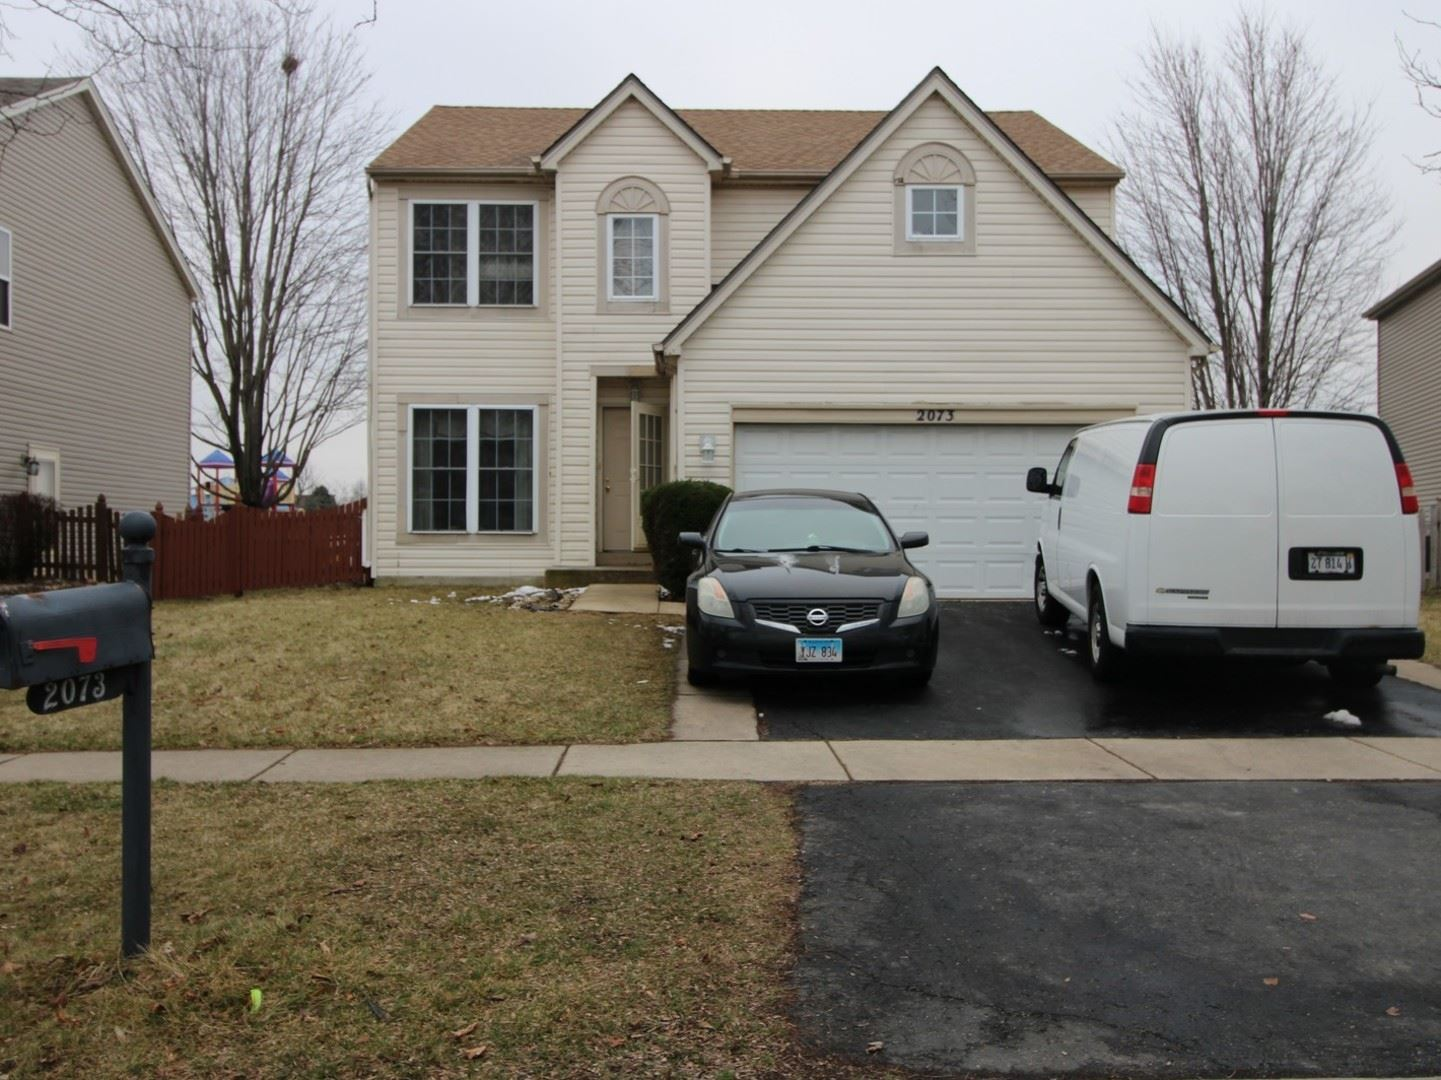 Photo of 2073 Kentland Drive, Romeoville, IL 60446 (MLS # 11023295)